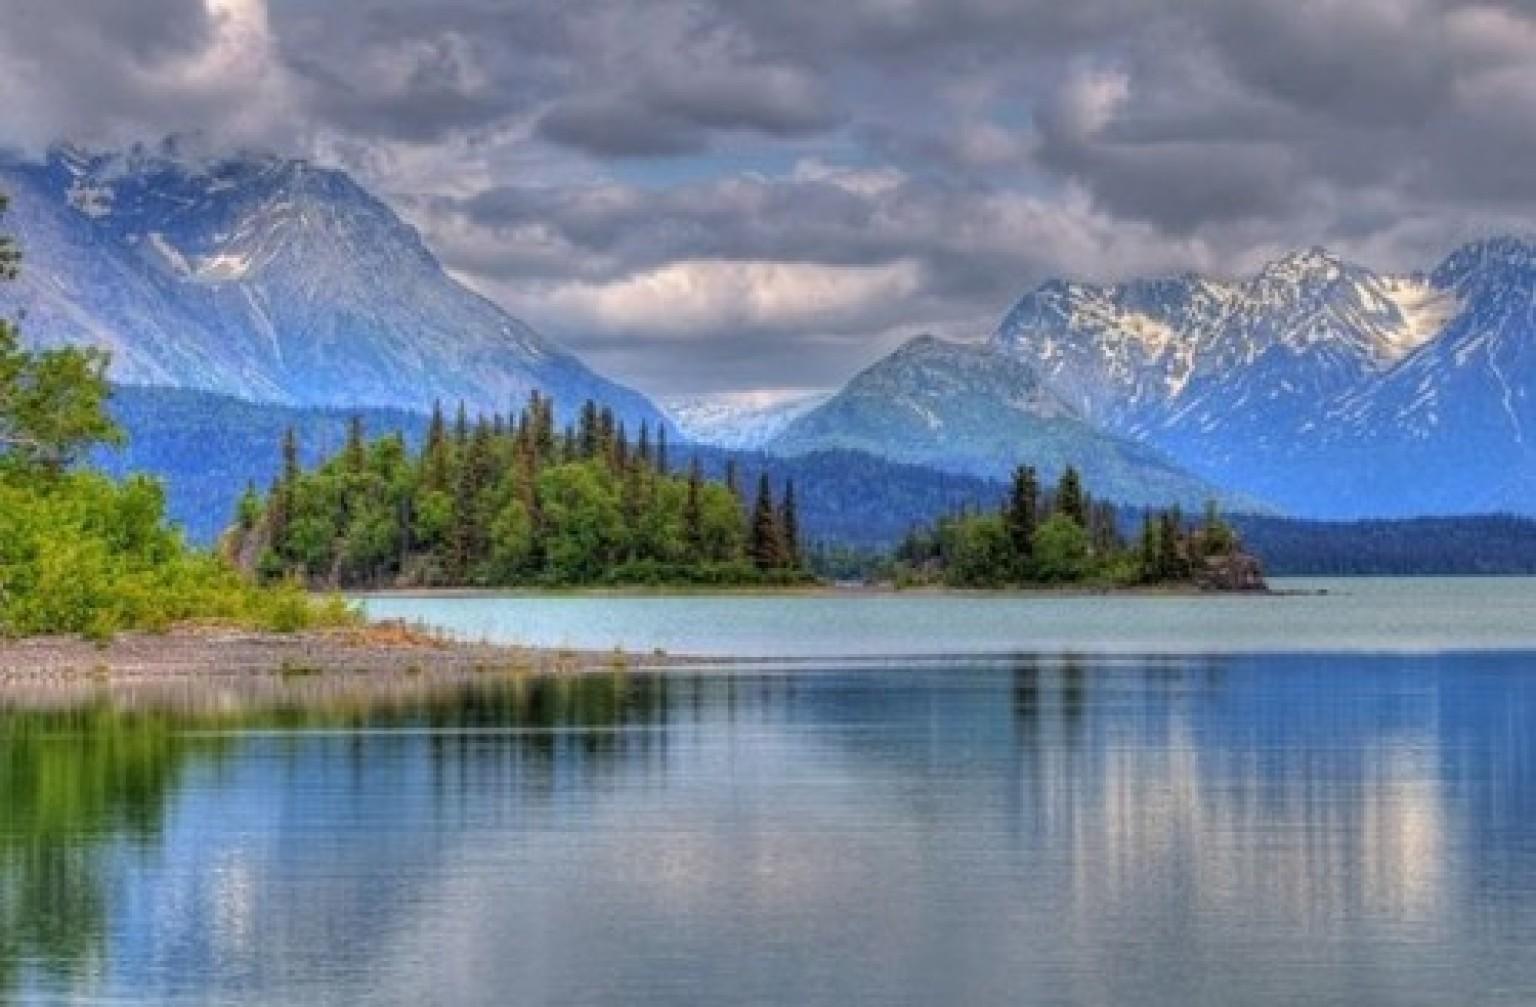 Alaskan Cruise Scenery 1536x1007 Download Hd Wallpaper Wallpapertip